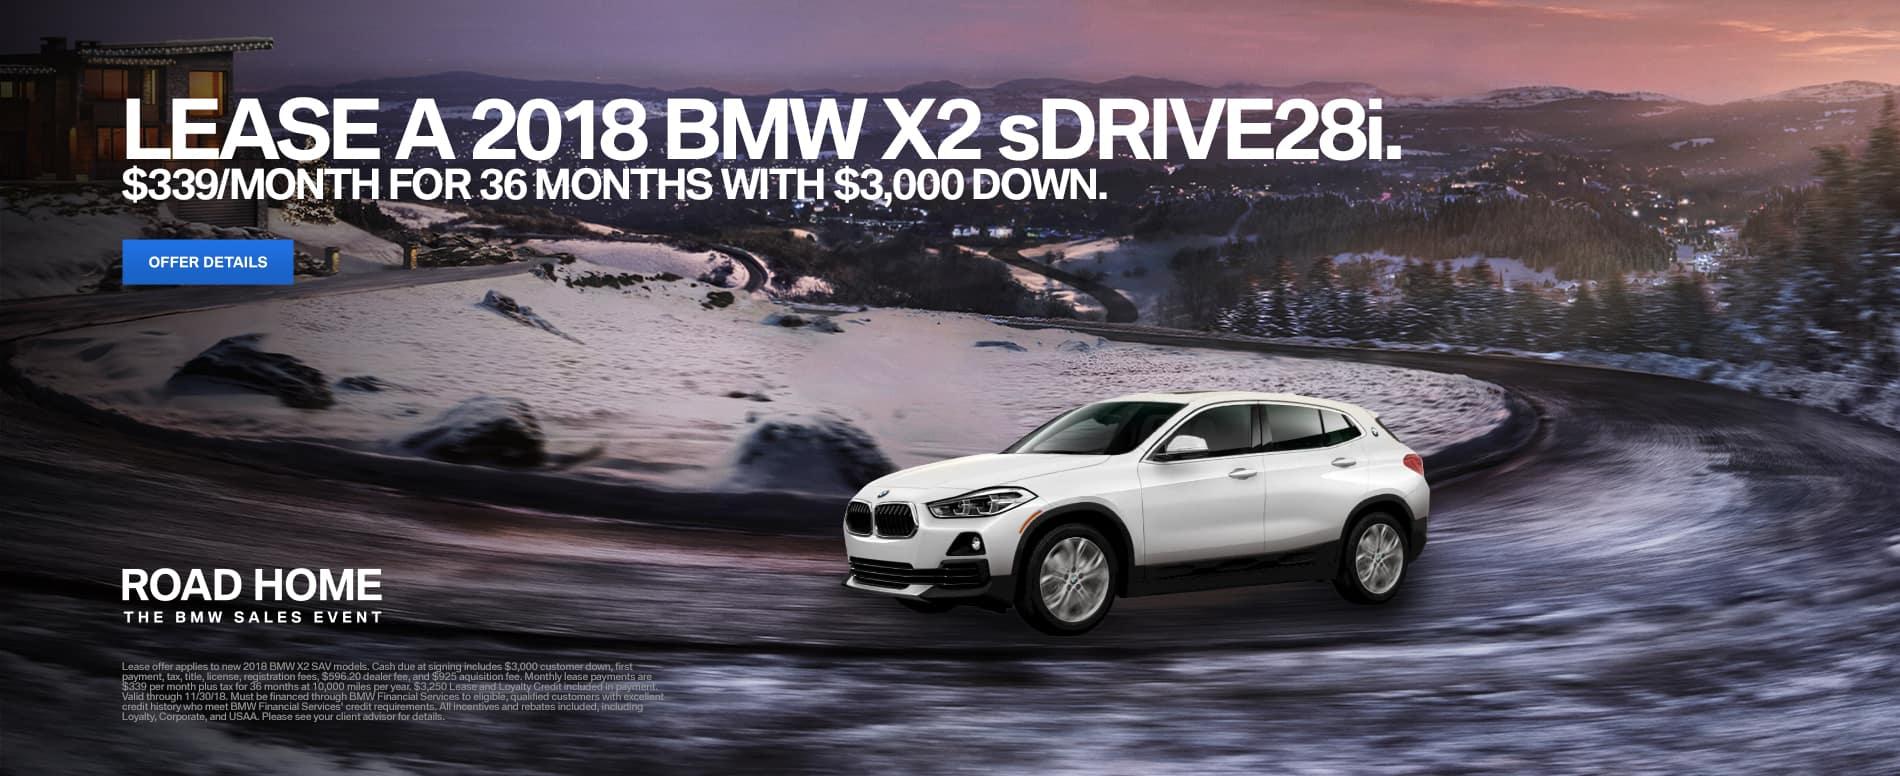 November BMW X2 Lease Offer